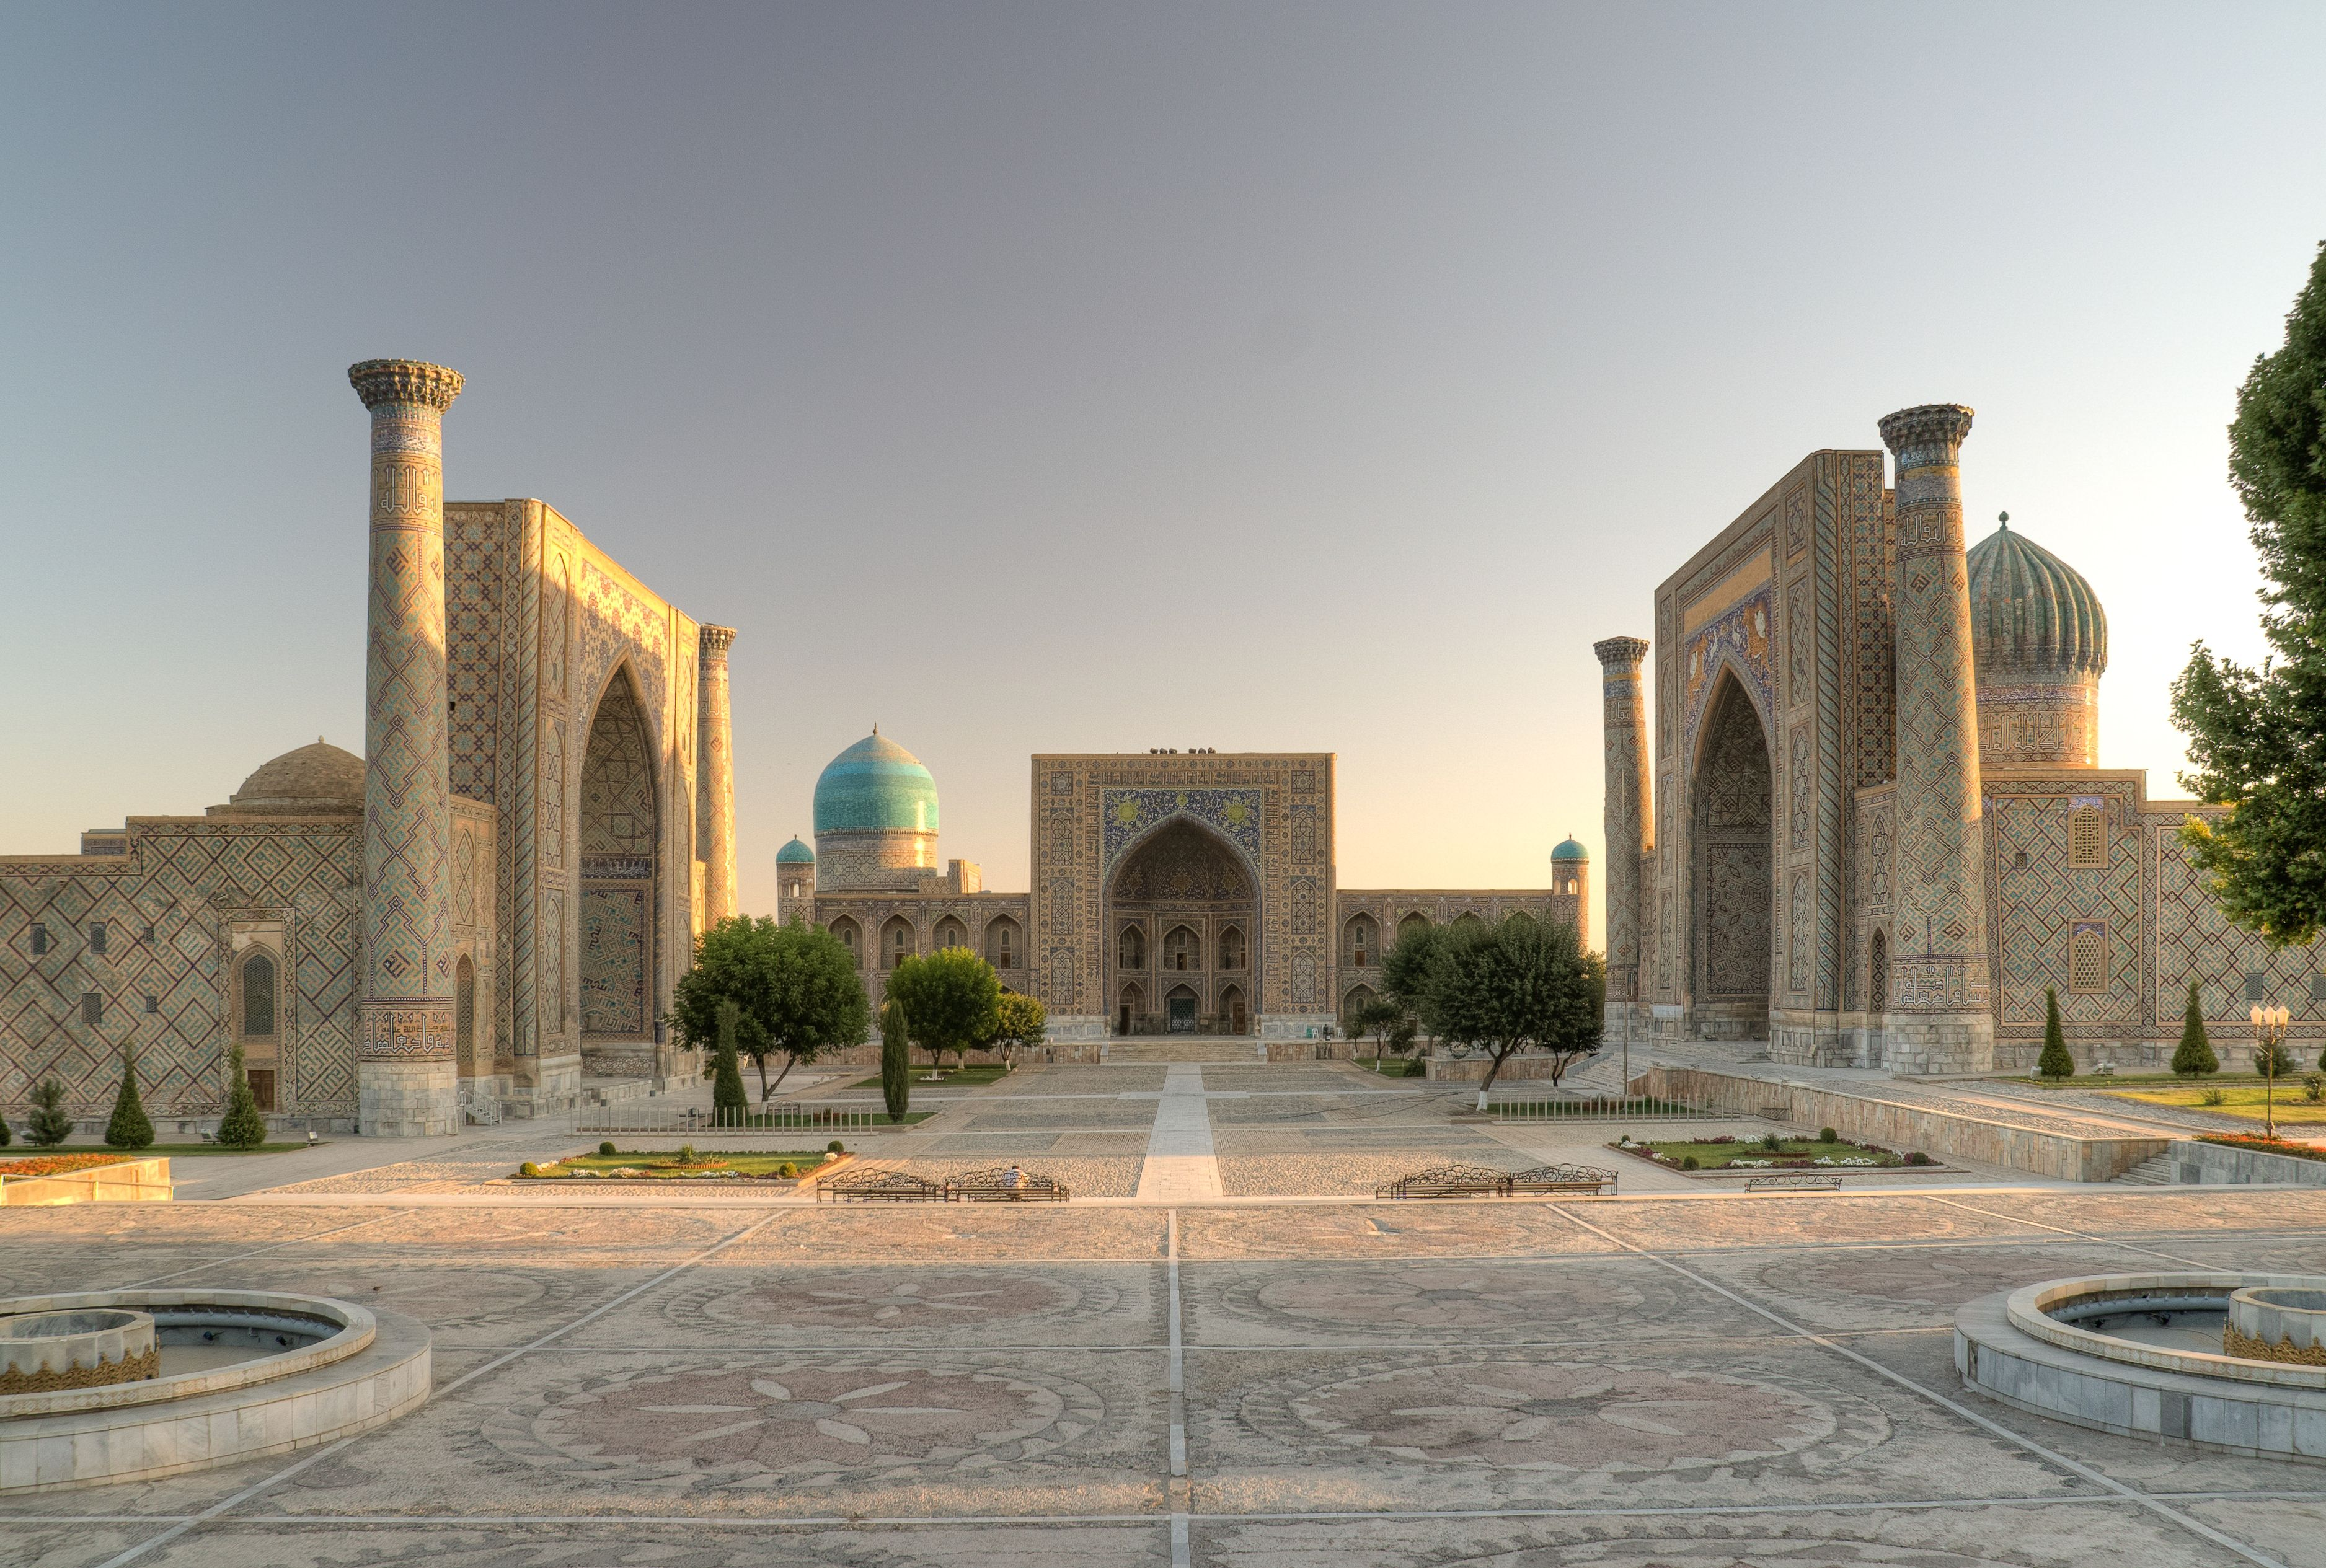 Samarkand, Registan, 15th century and later, Uzbekistan. (The Registan and its three madrasahs. From left to right: Ulugh Beg Madrasah, Tilya-Kori Madrasah and Sher-Dor Madrasah.)